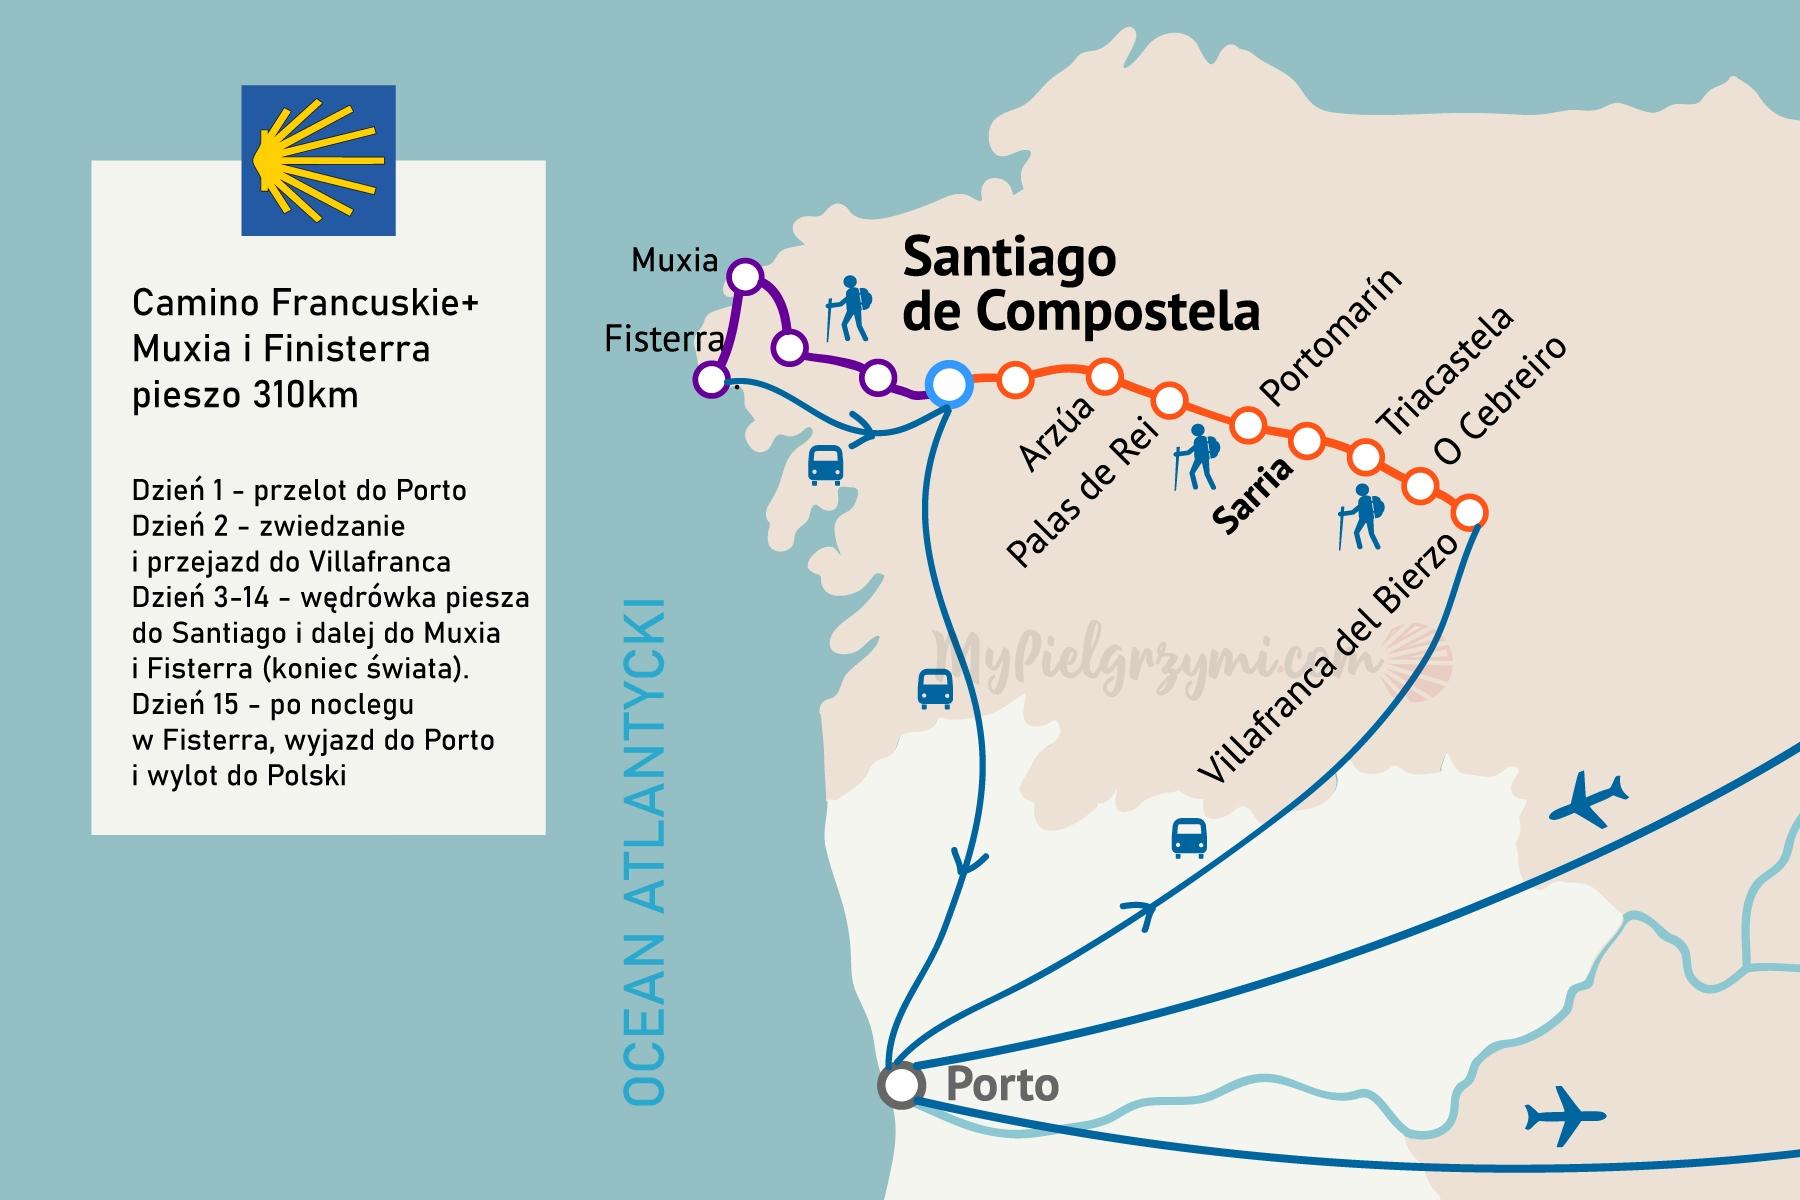 Camino Frances oraz Camino Muxia i Fisterra